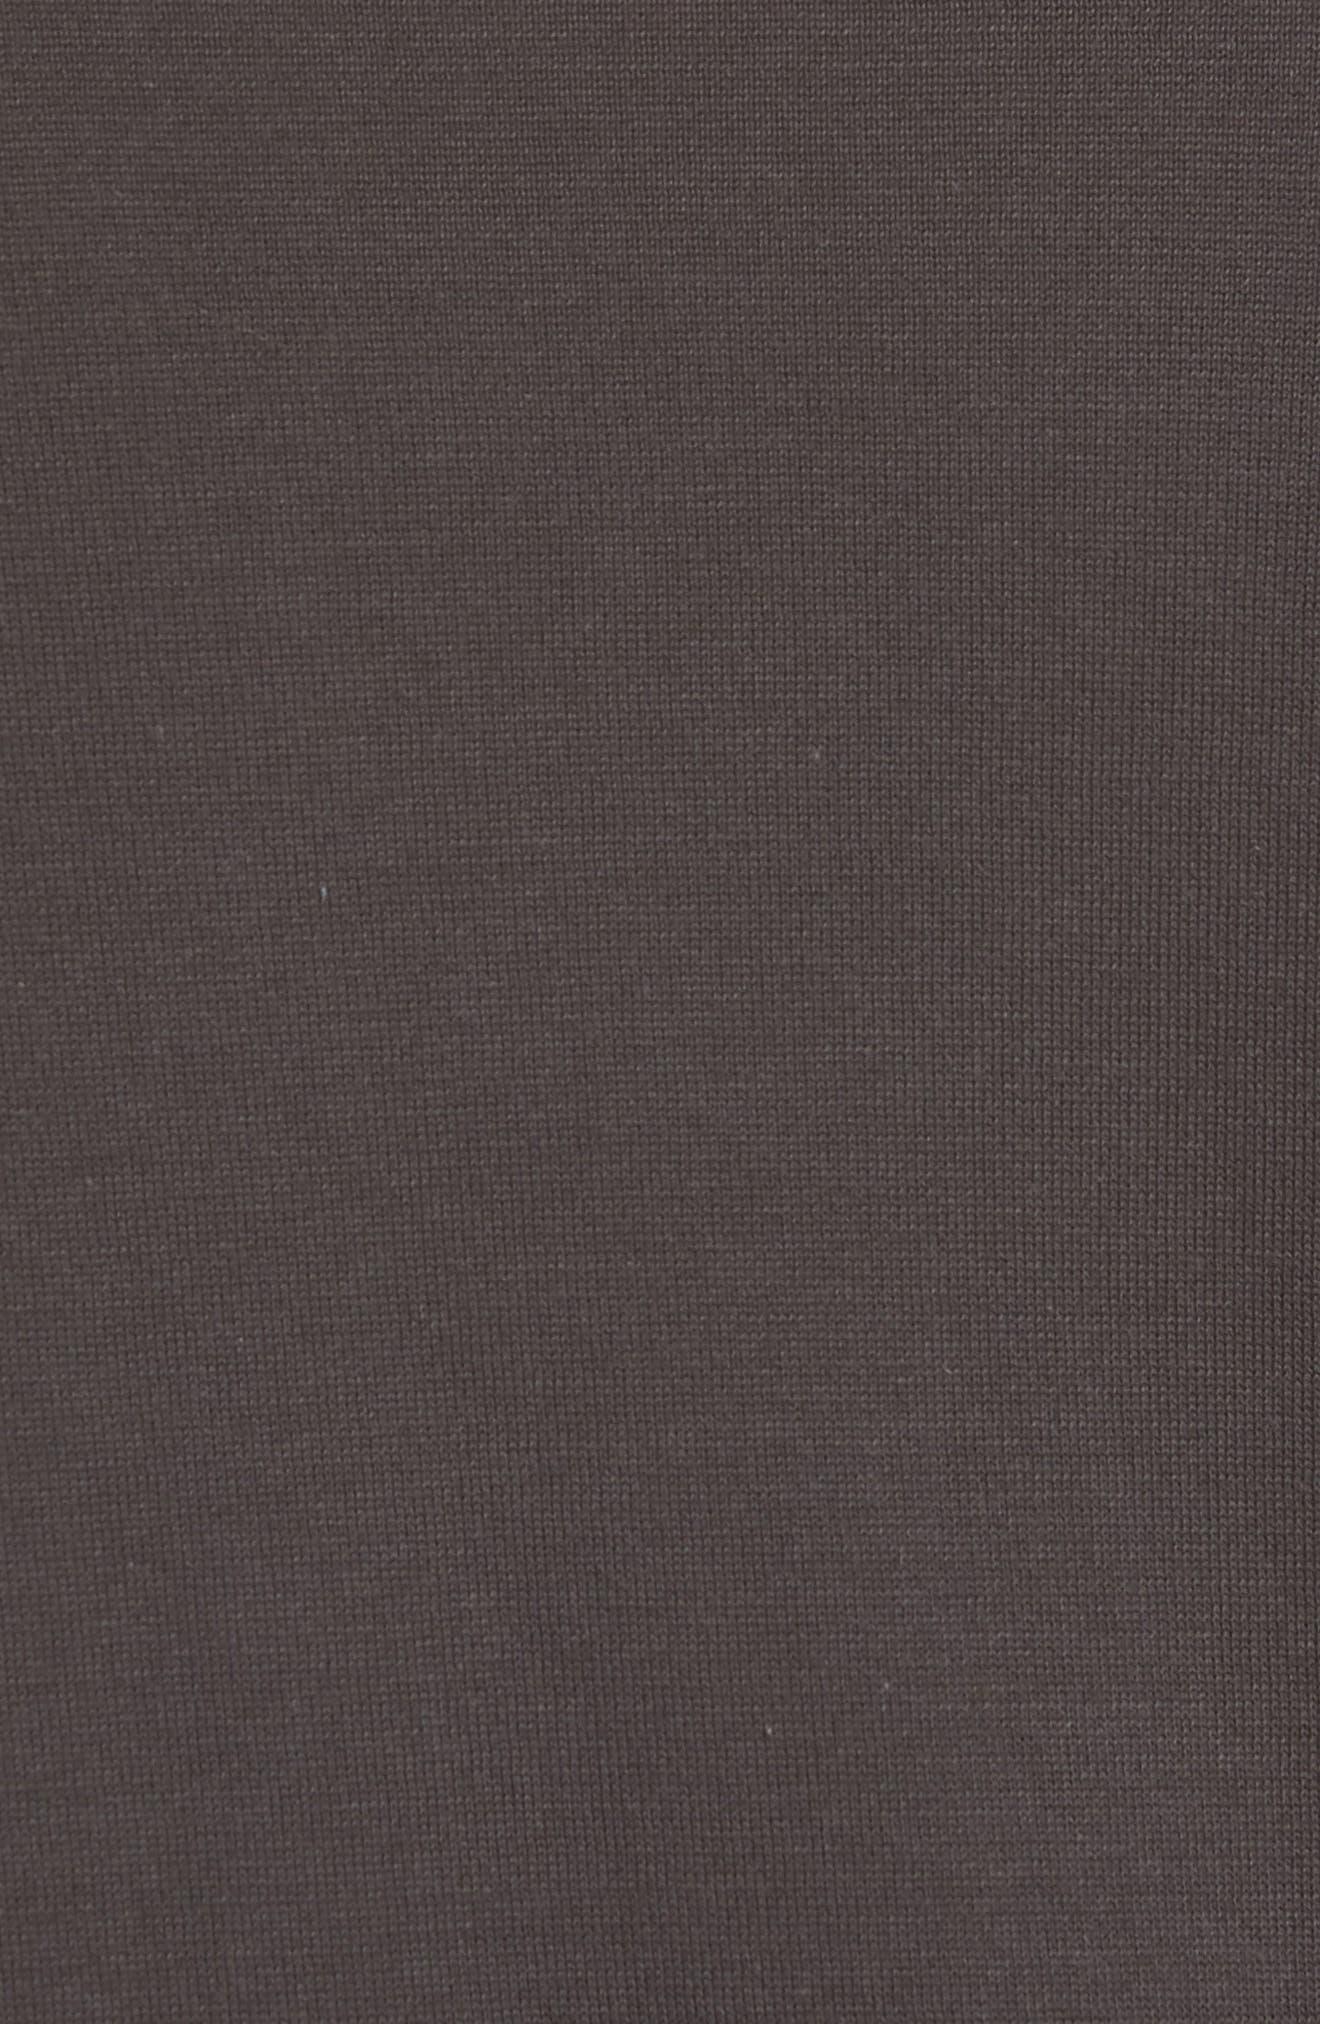 Slim Fit Pima Cotton Sweater T-Shirt,                             Alternate thumbnail 5, color,                             020